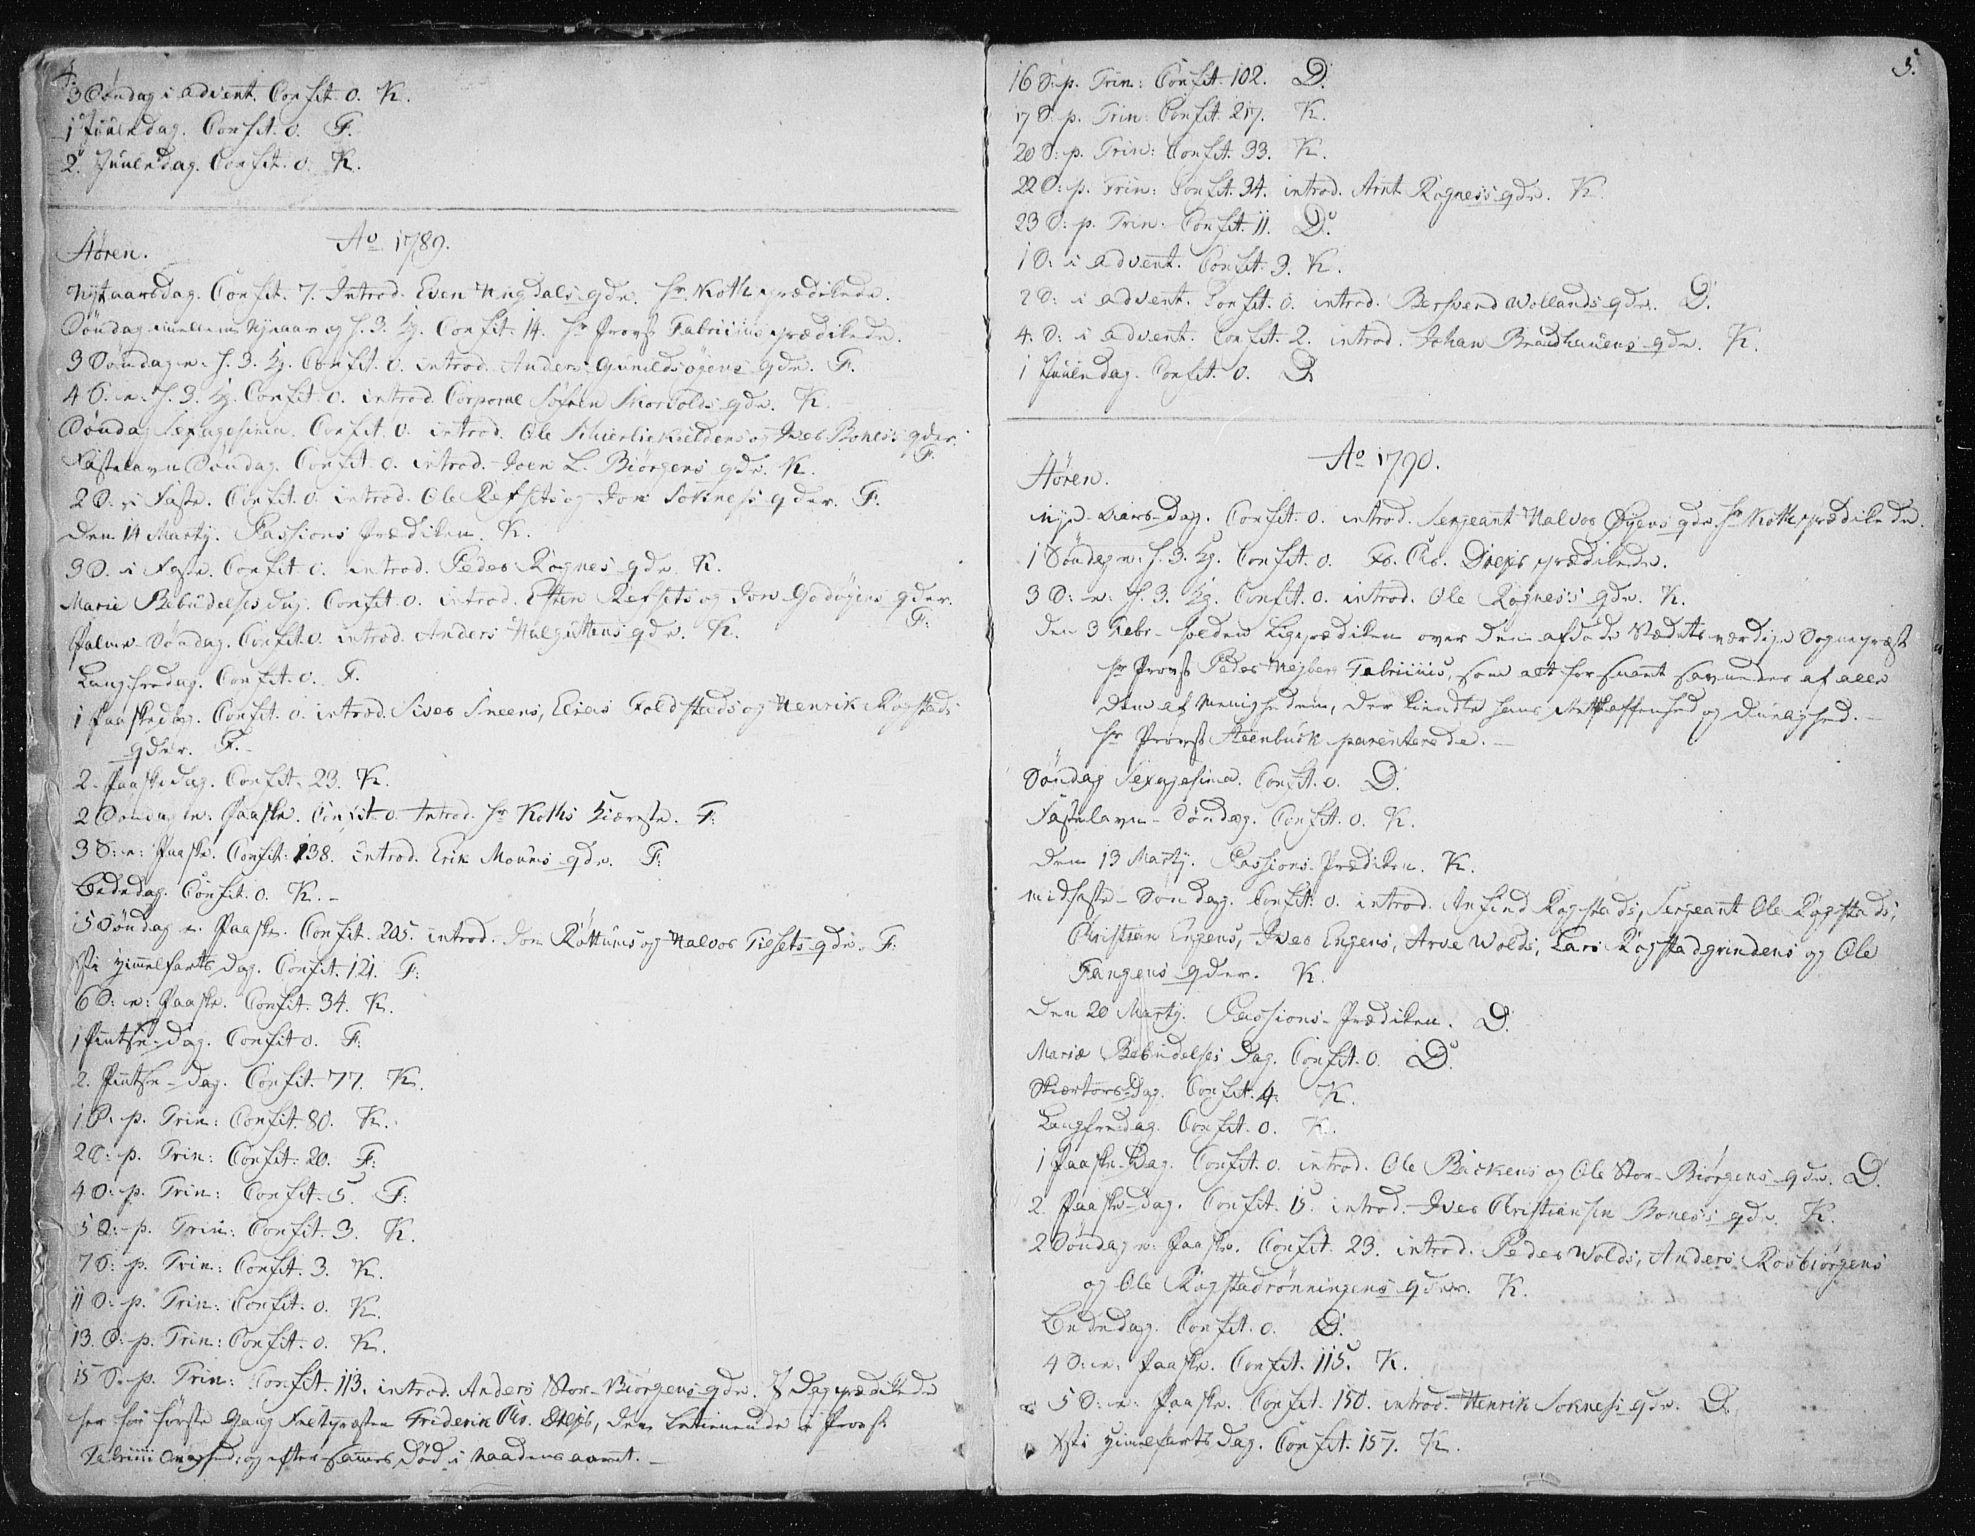 SAT, Ministerialprotokoller, klokkerbøker og fødselsregistre - Sør-Trøndelag, 687/L0992: Parish register (official) no. 687A03 /1, 1788-1815, p. 4-5